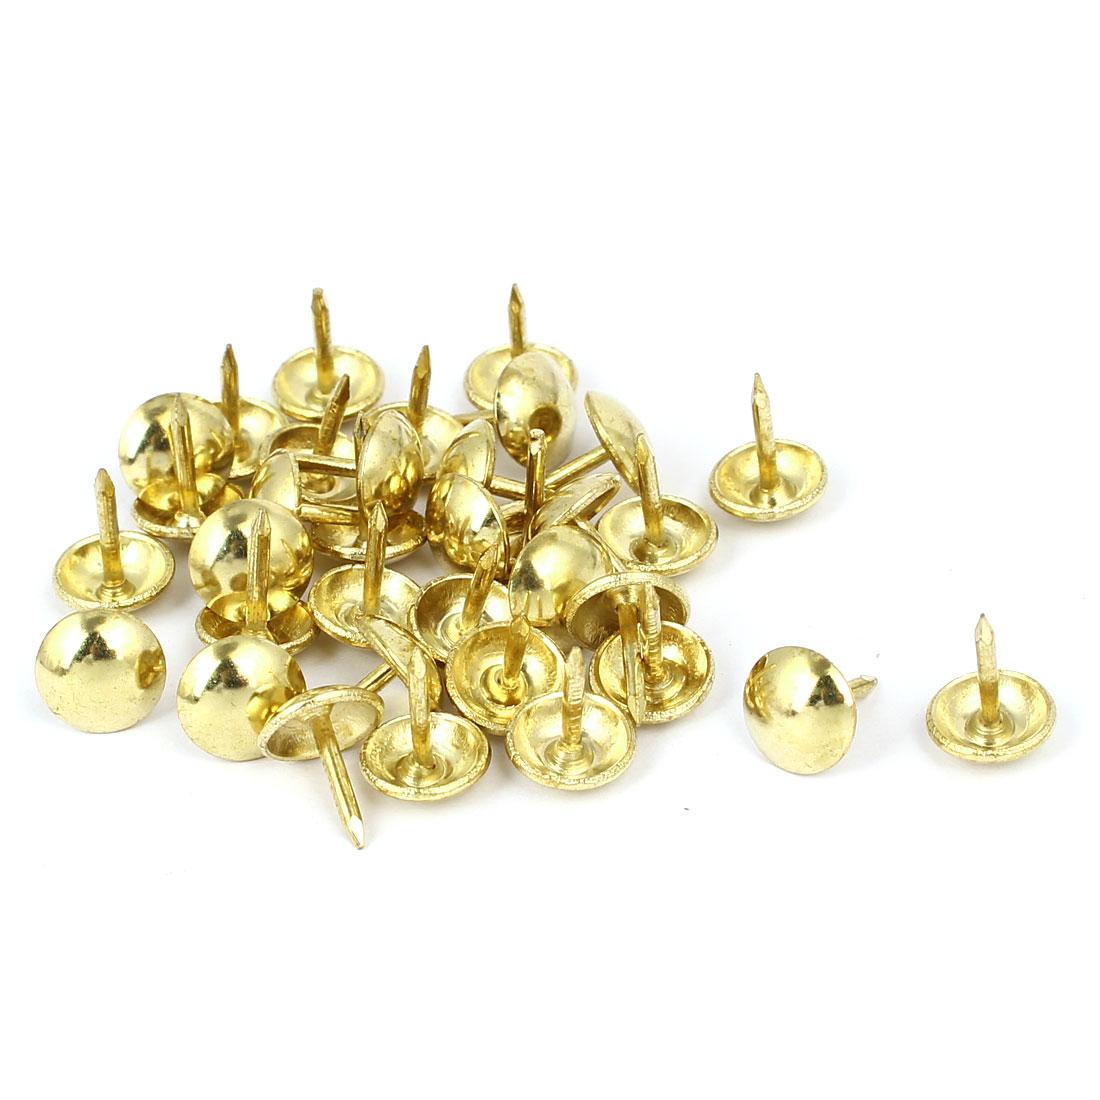 Home Furniture Upholstery Thumb Tack Nail Push Pin Gold Tone 9mm x 11mm 35pcs